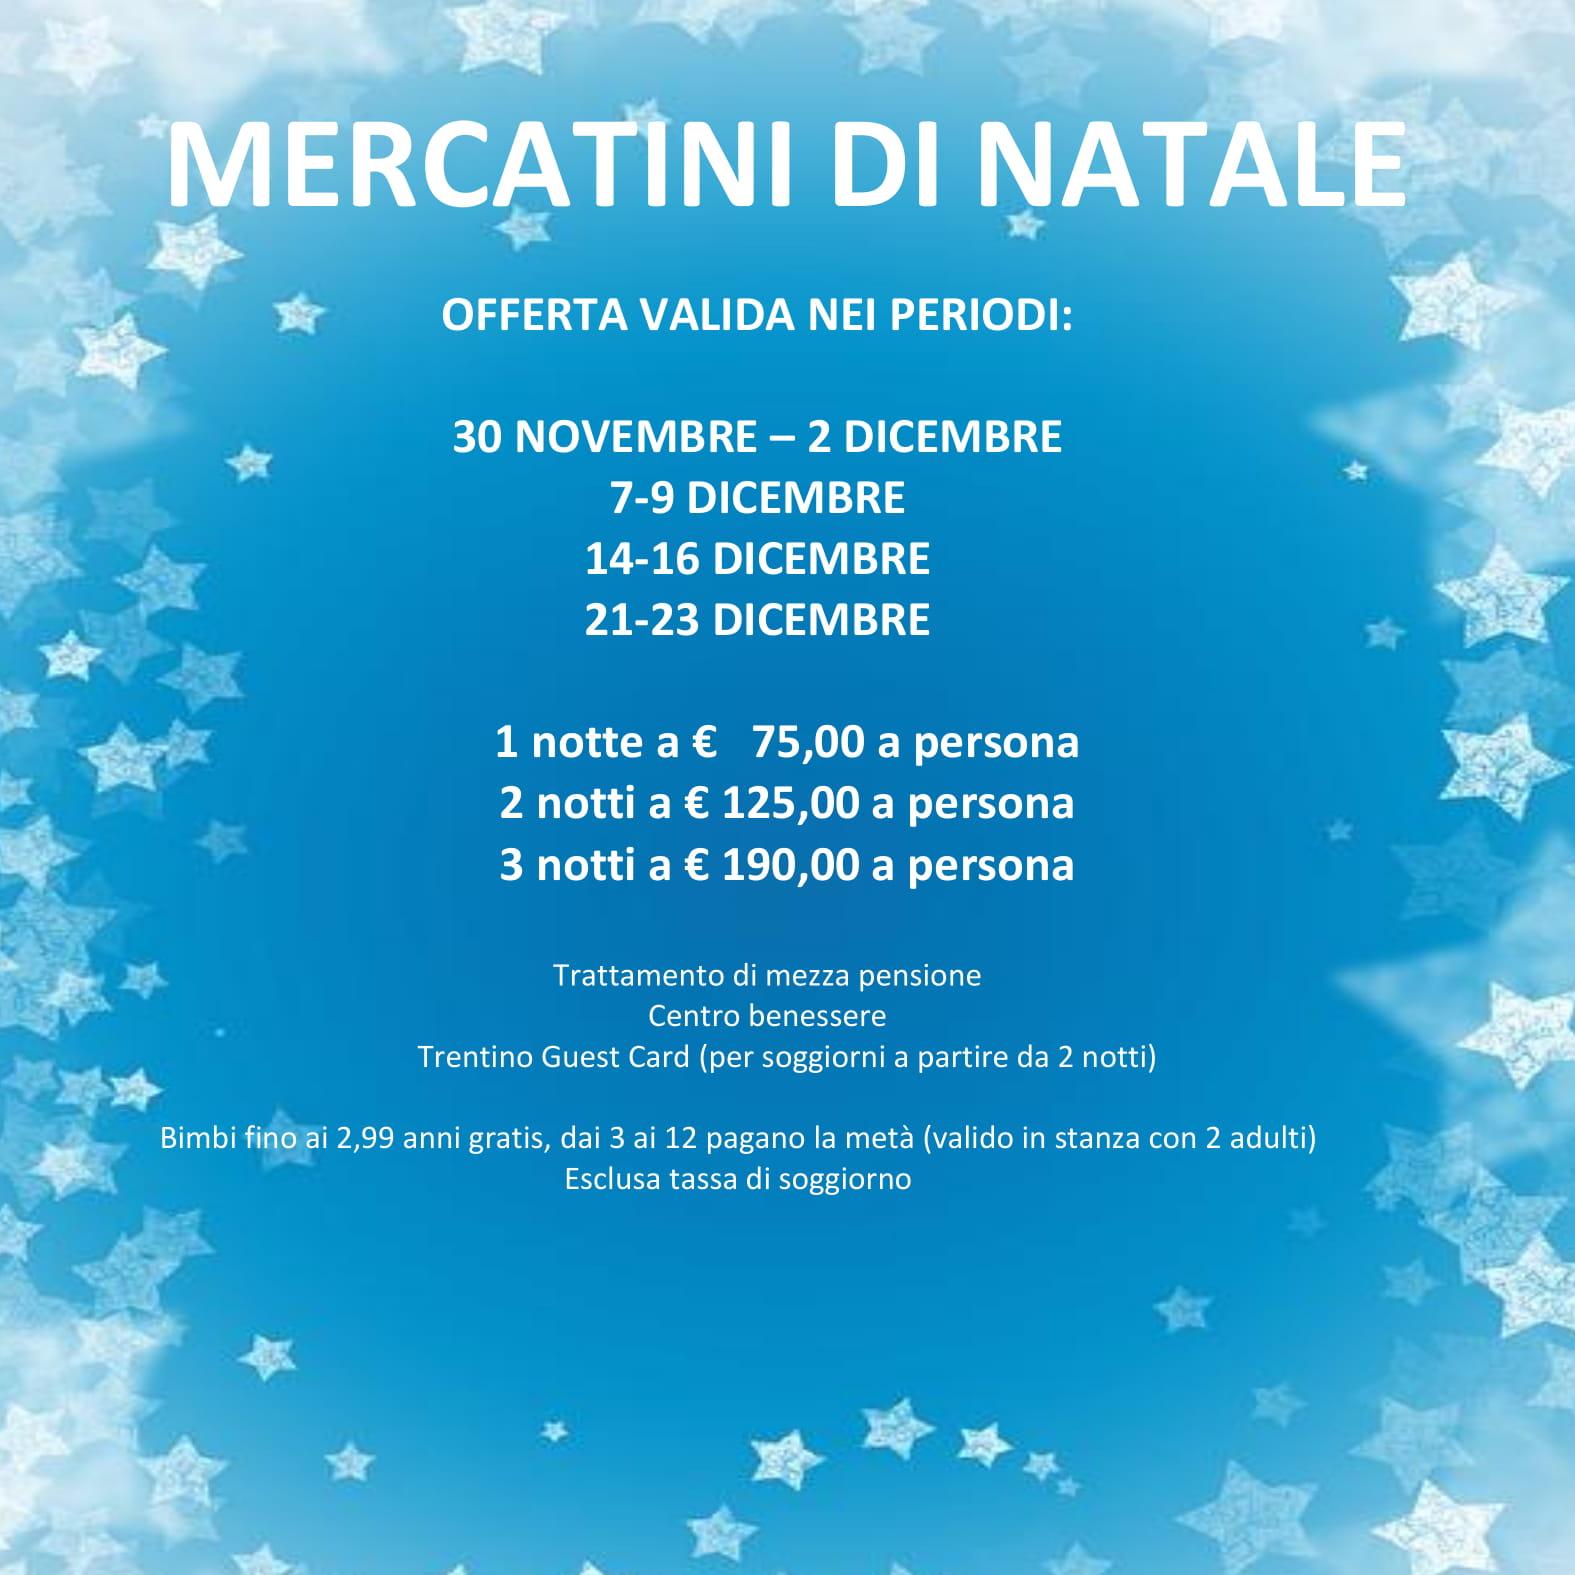 MERCATINI DI NATALE 2018-IMMAGINE